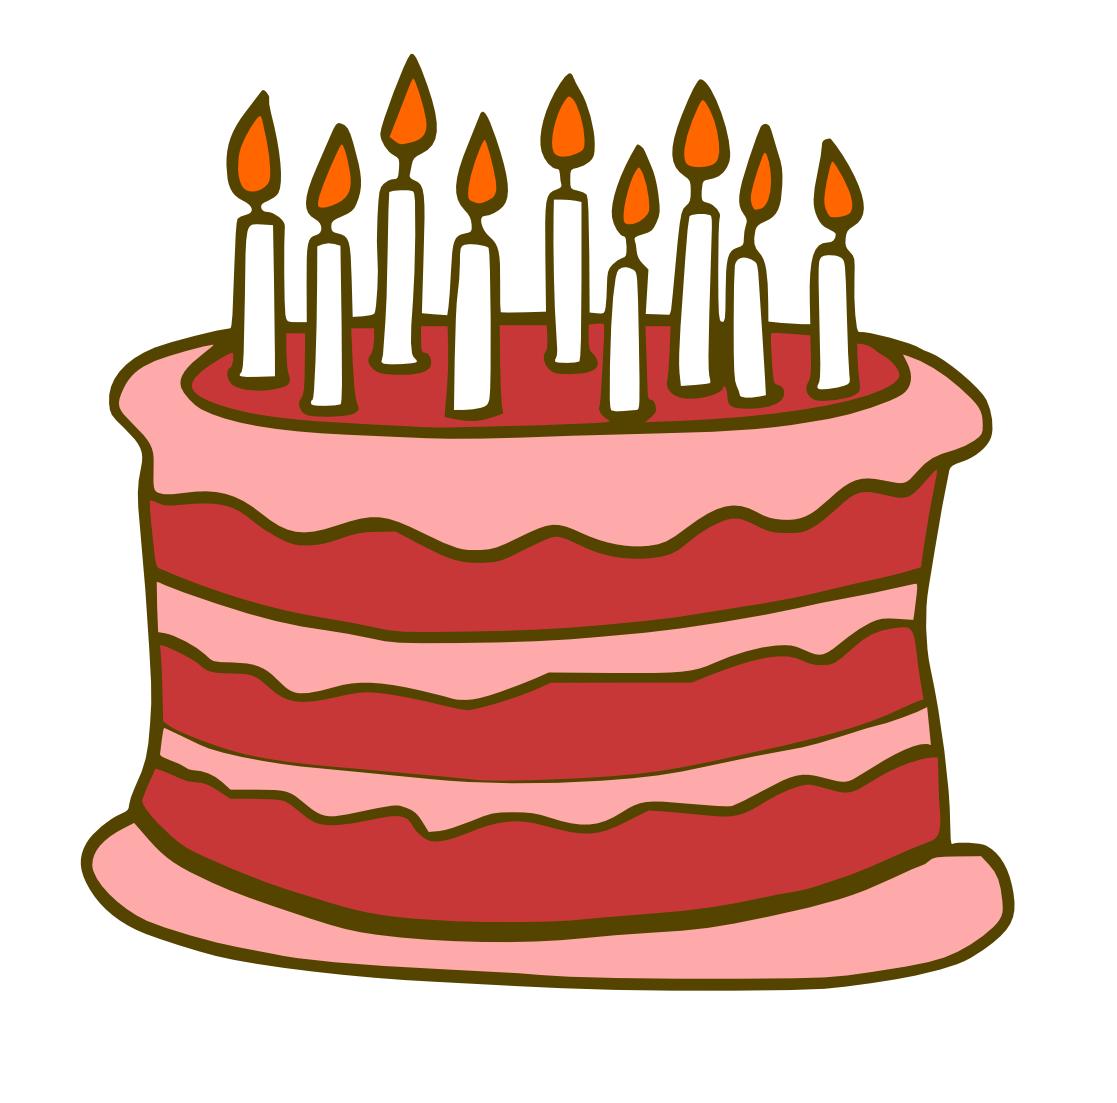 Birthdaycake Cliparts Stock Vector And Royalty Free